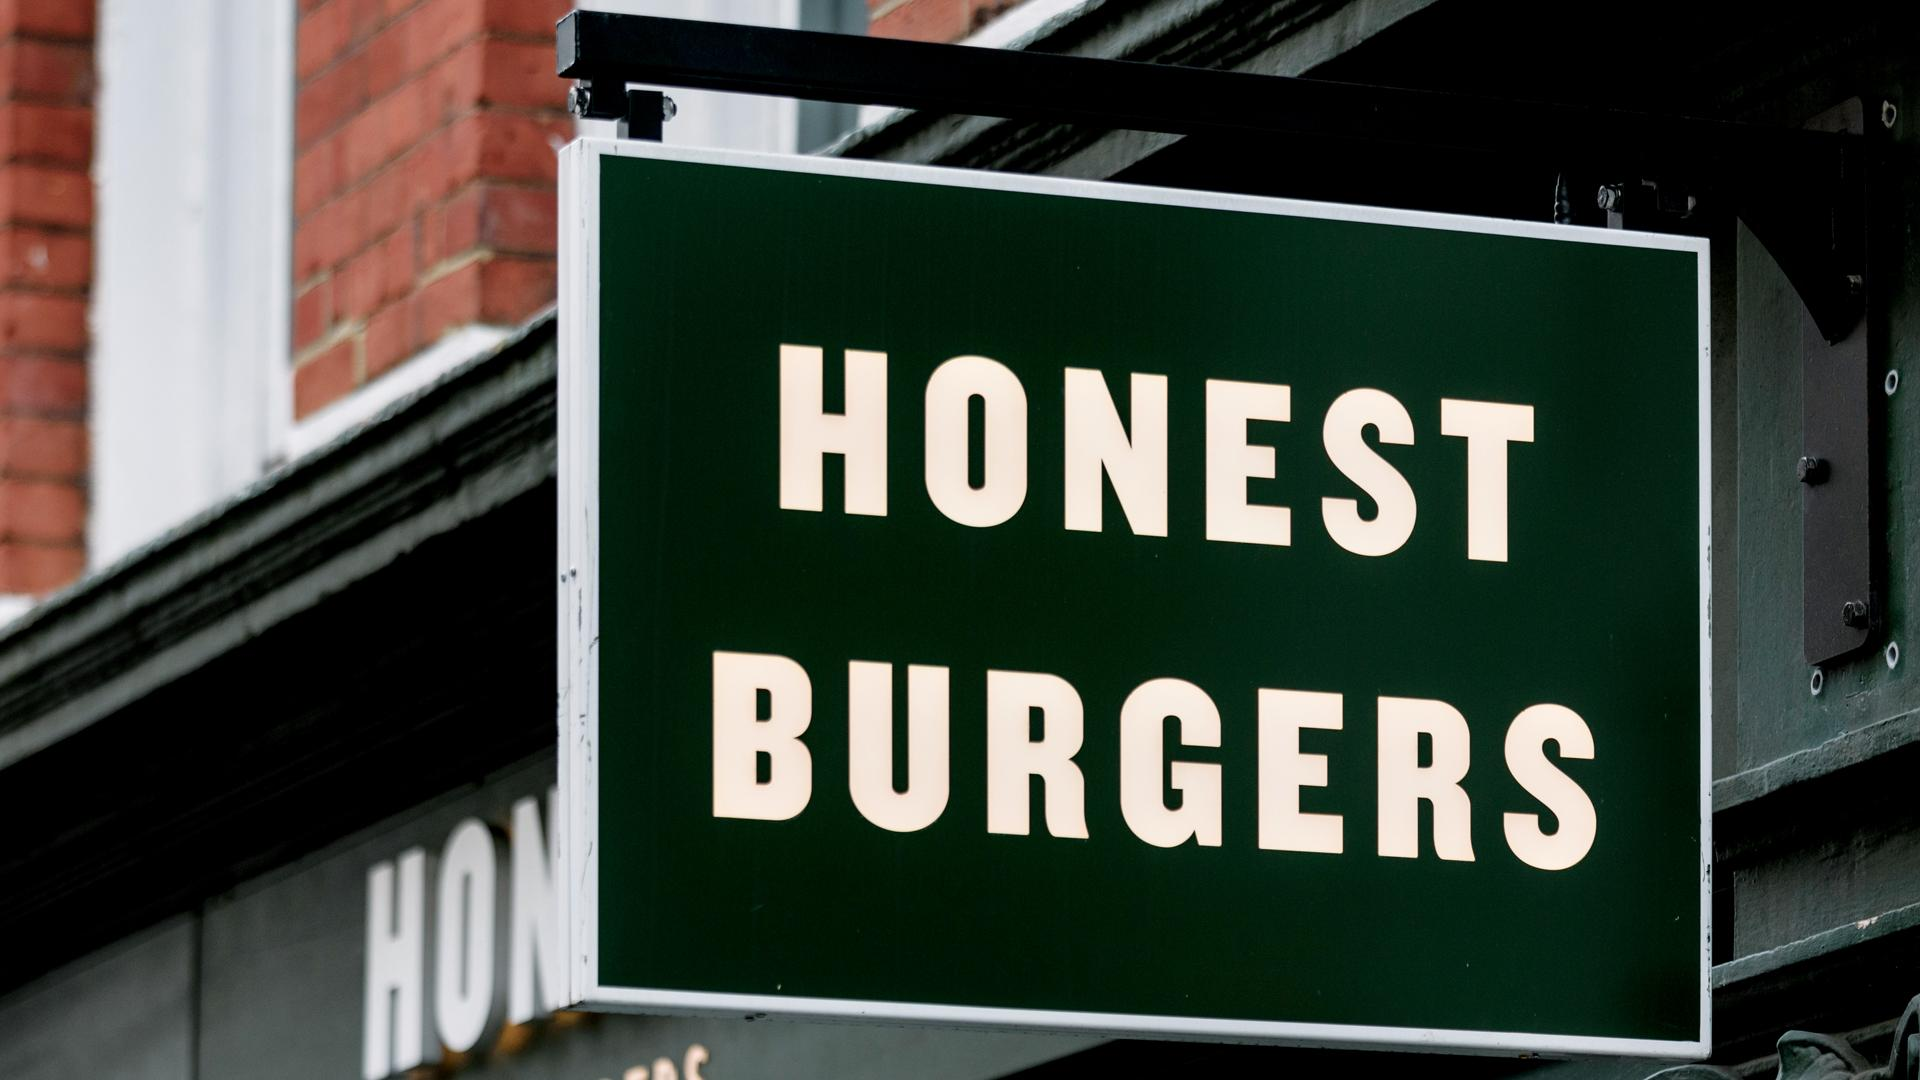 Honest Burgers at Brixton Village and Market Row, London, UK